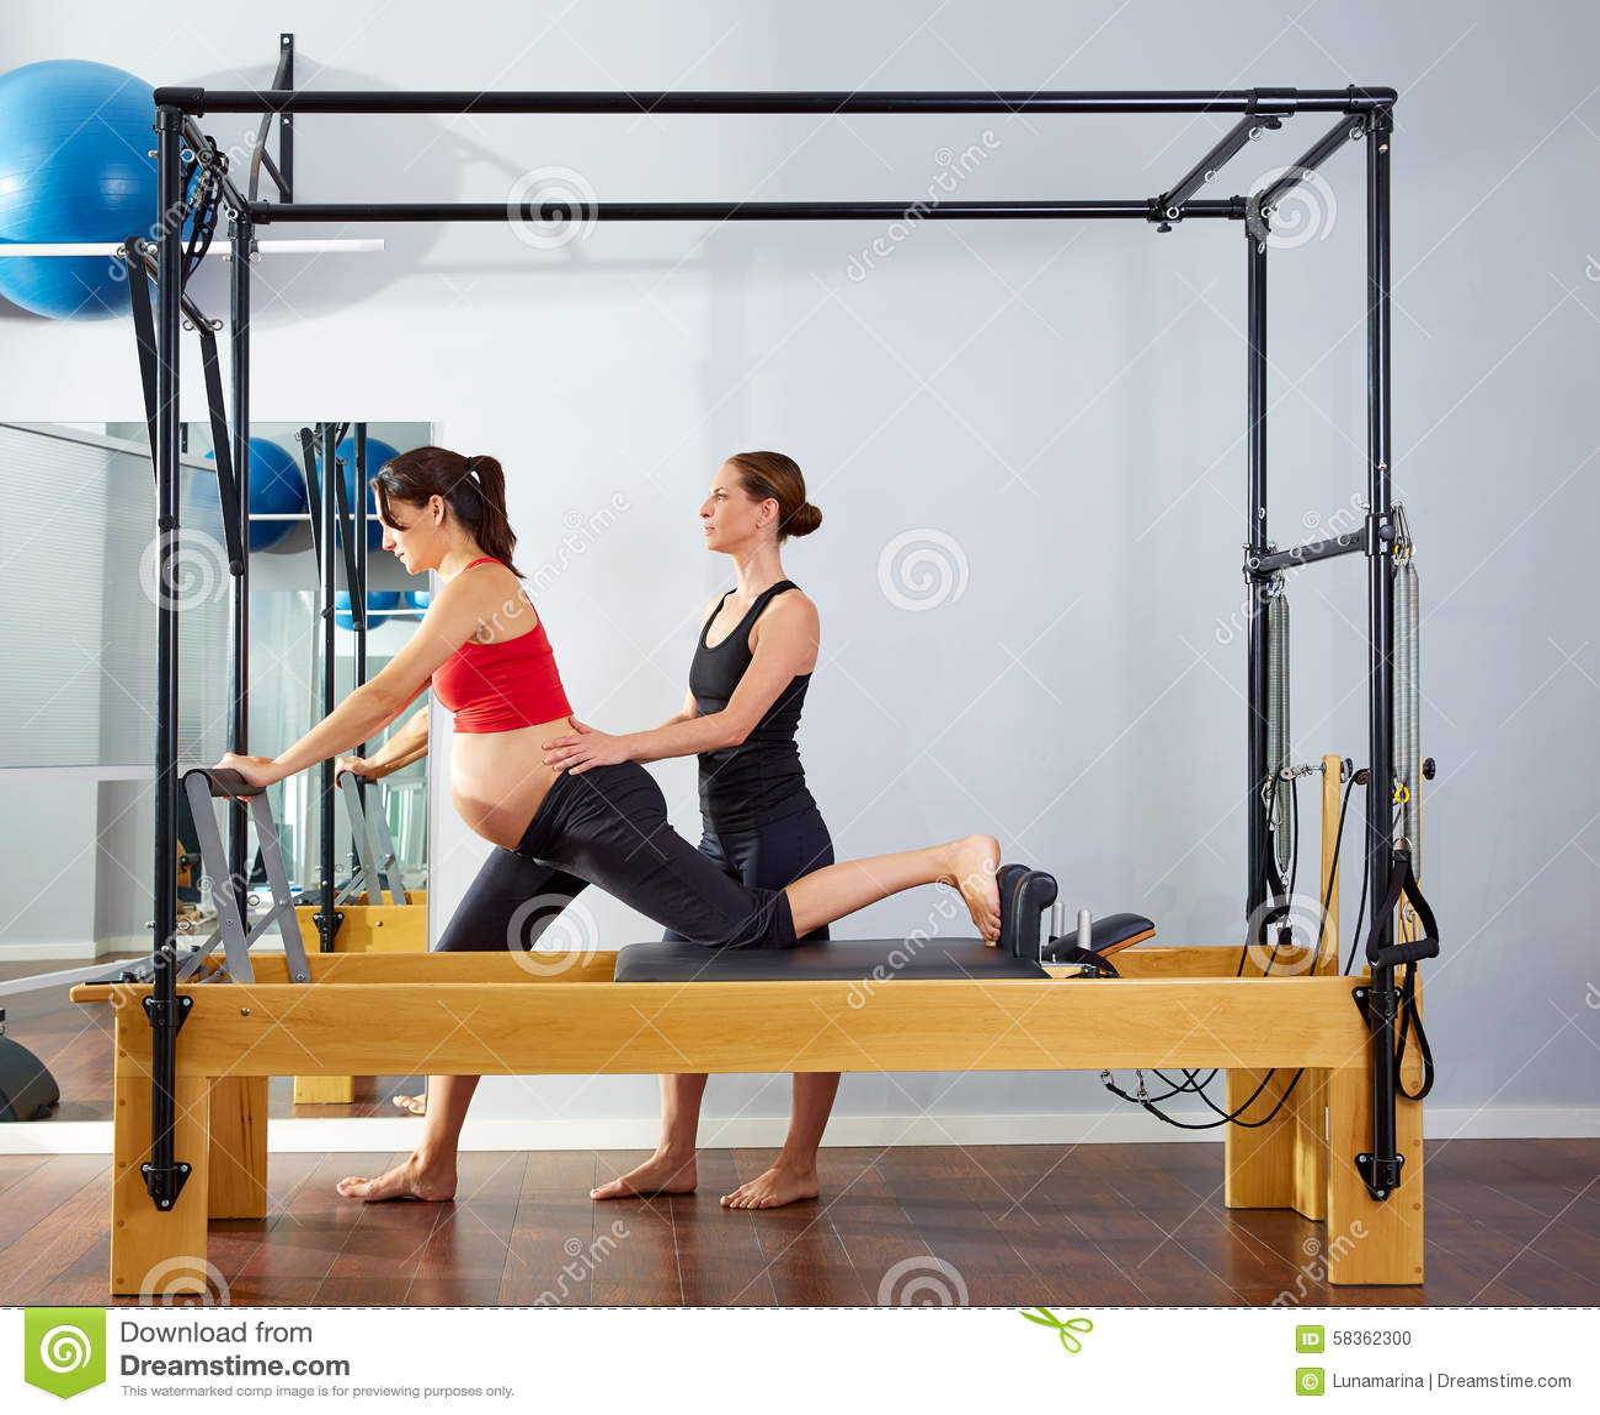 Woman Pilates Chair Exercises Fitness Stock Photo: Pregnant Woman Pilates Reformer Cadillac Exercise Stock